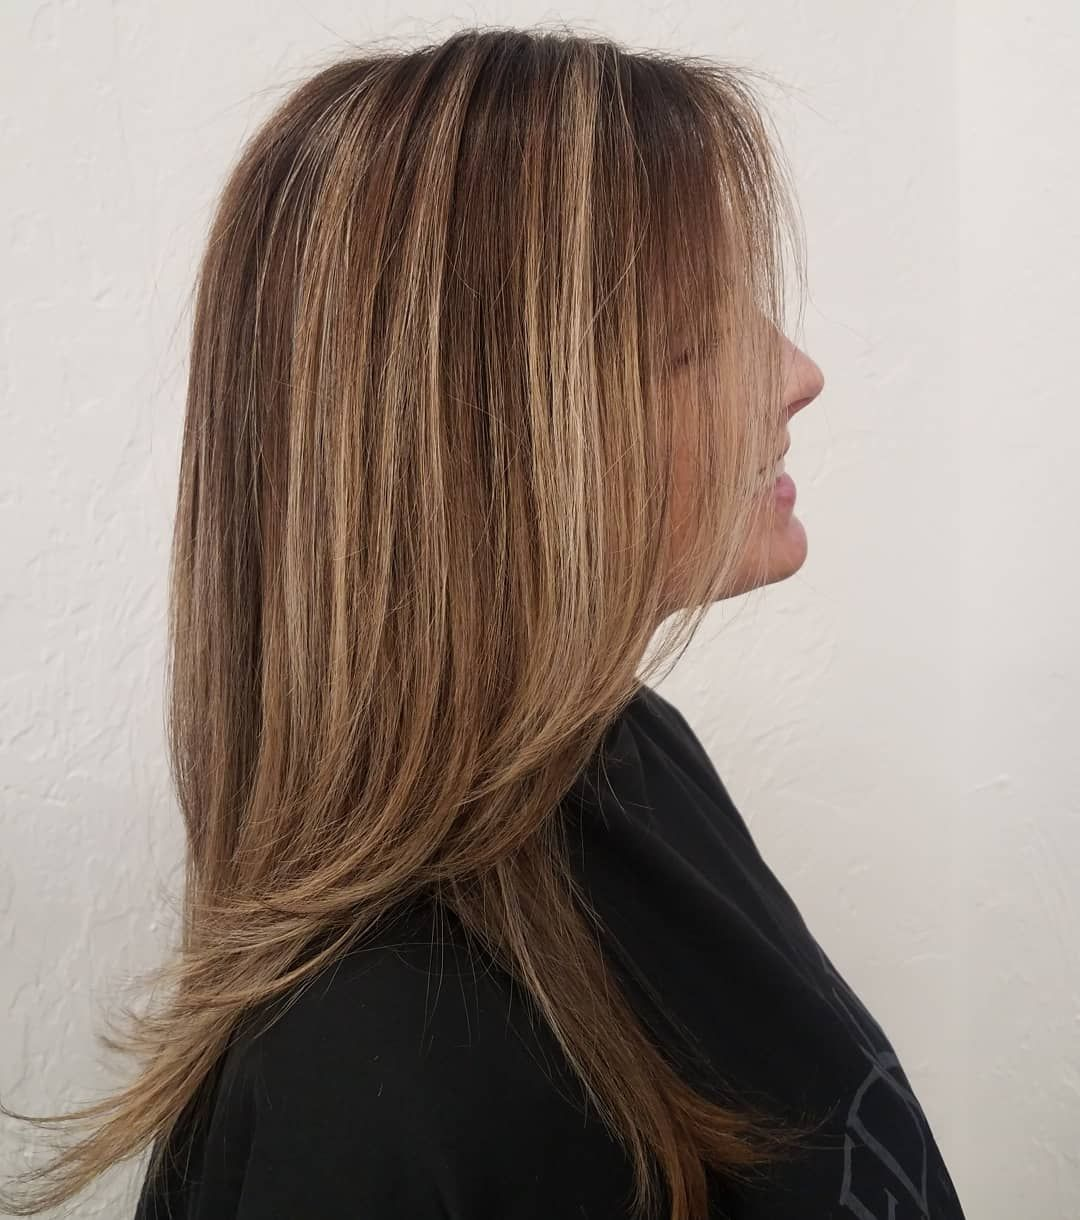 Friyay Studiork Redkenobsessed Redken Samvillahair Fortmyershairstylist Swfl Meganknighthair Hairgoals Keras Long Hair Styles Hair Styles Hair